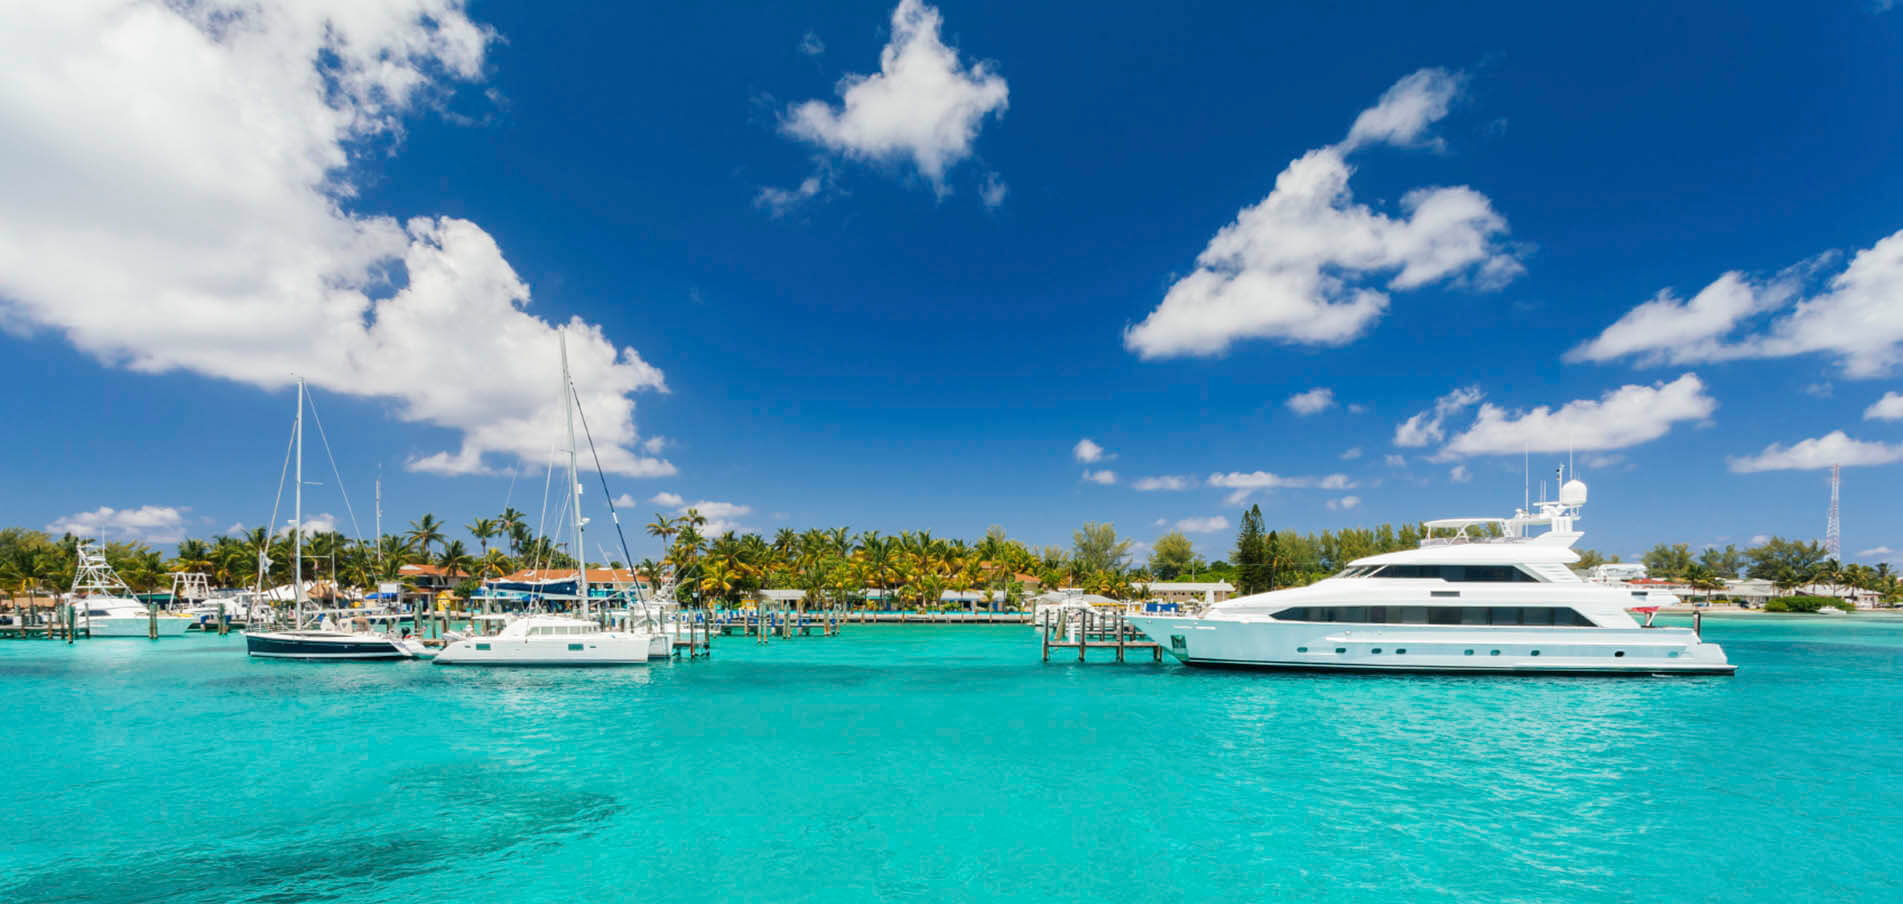 Charter de Superyacht Bahamas